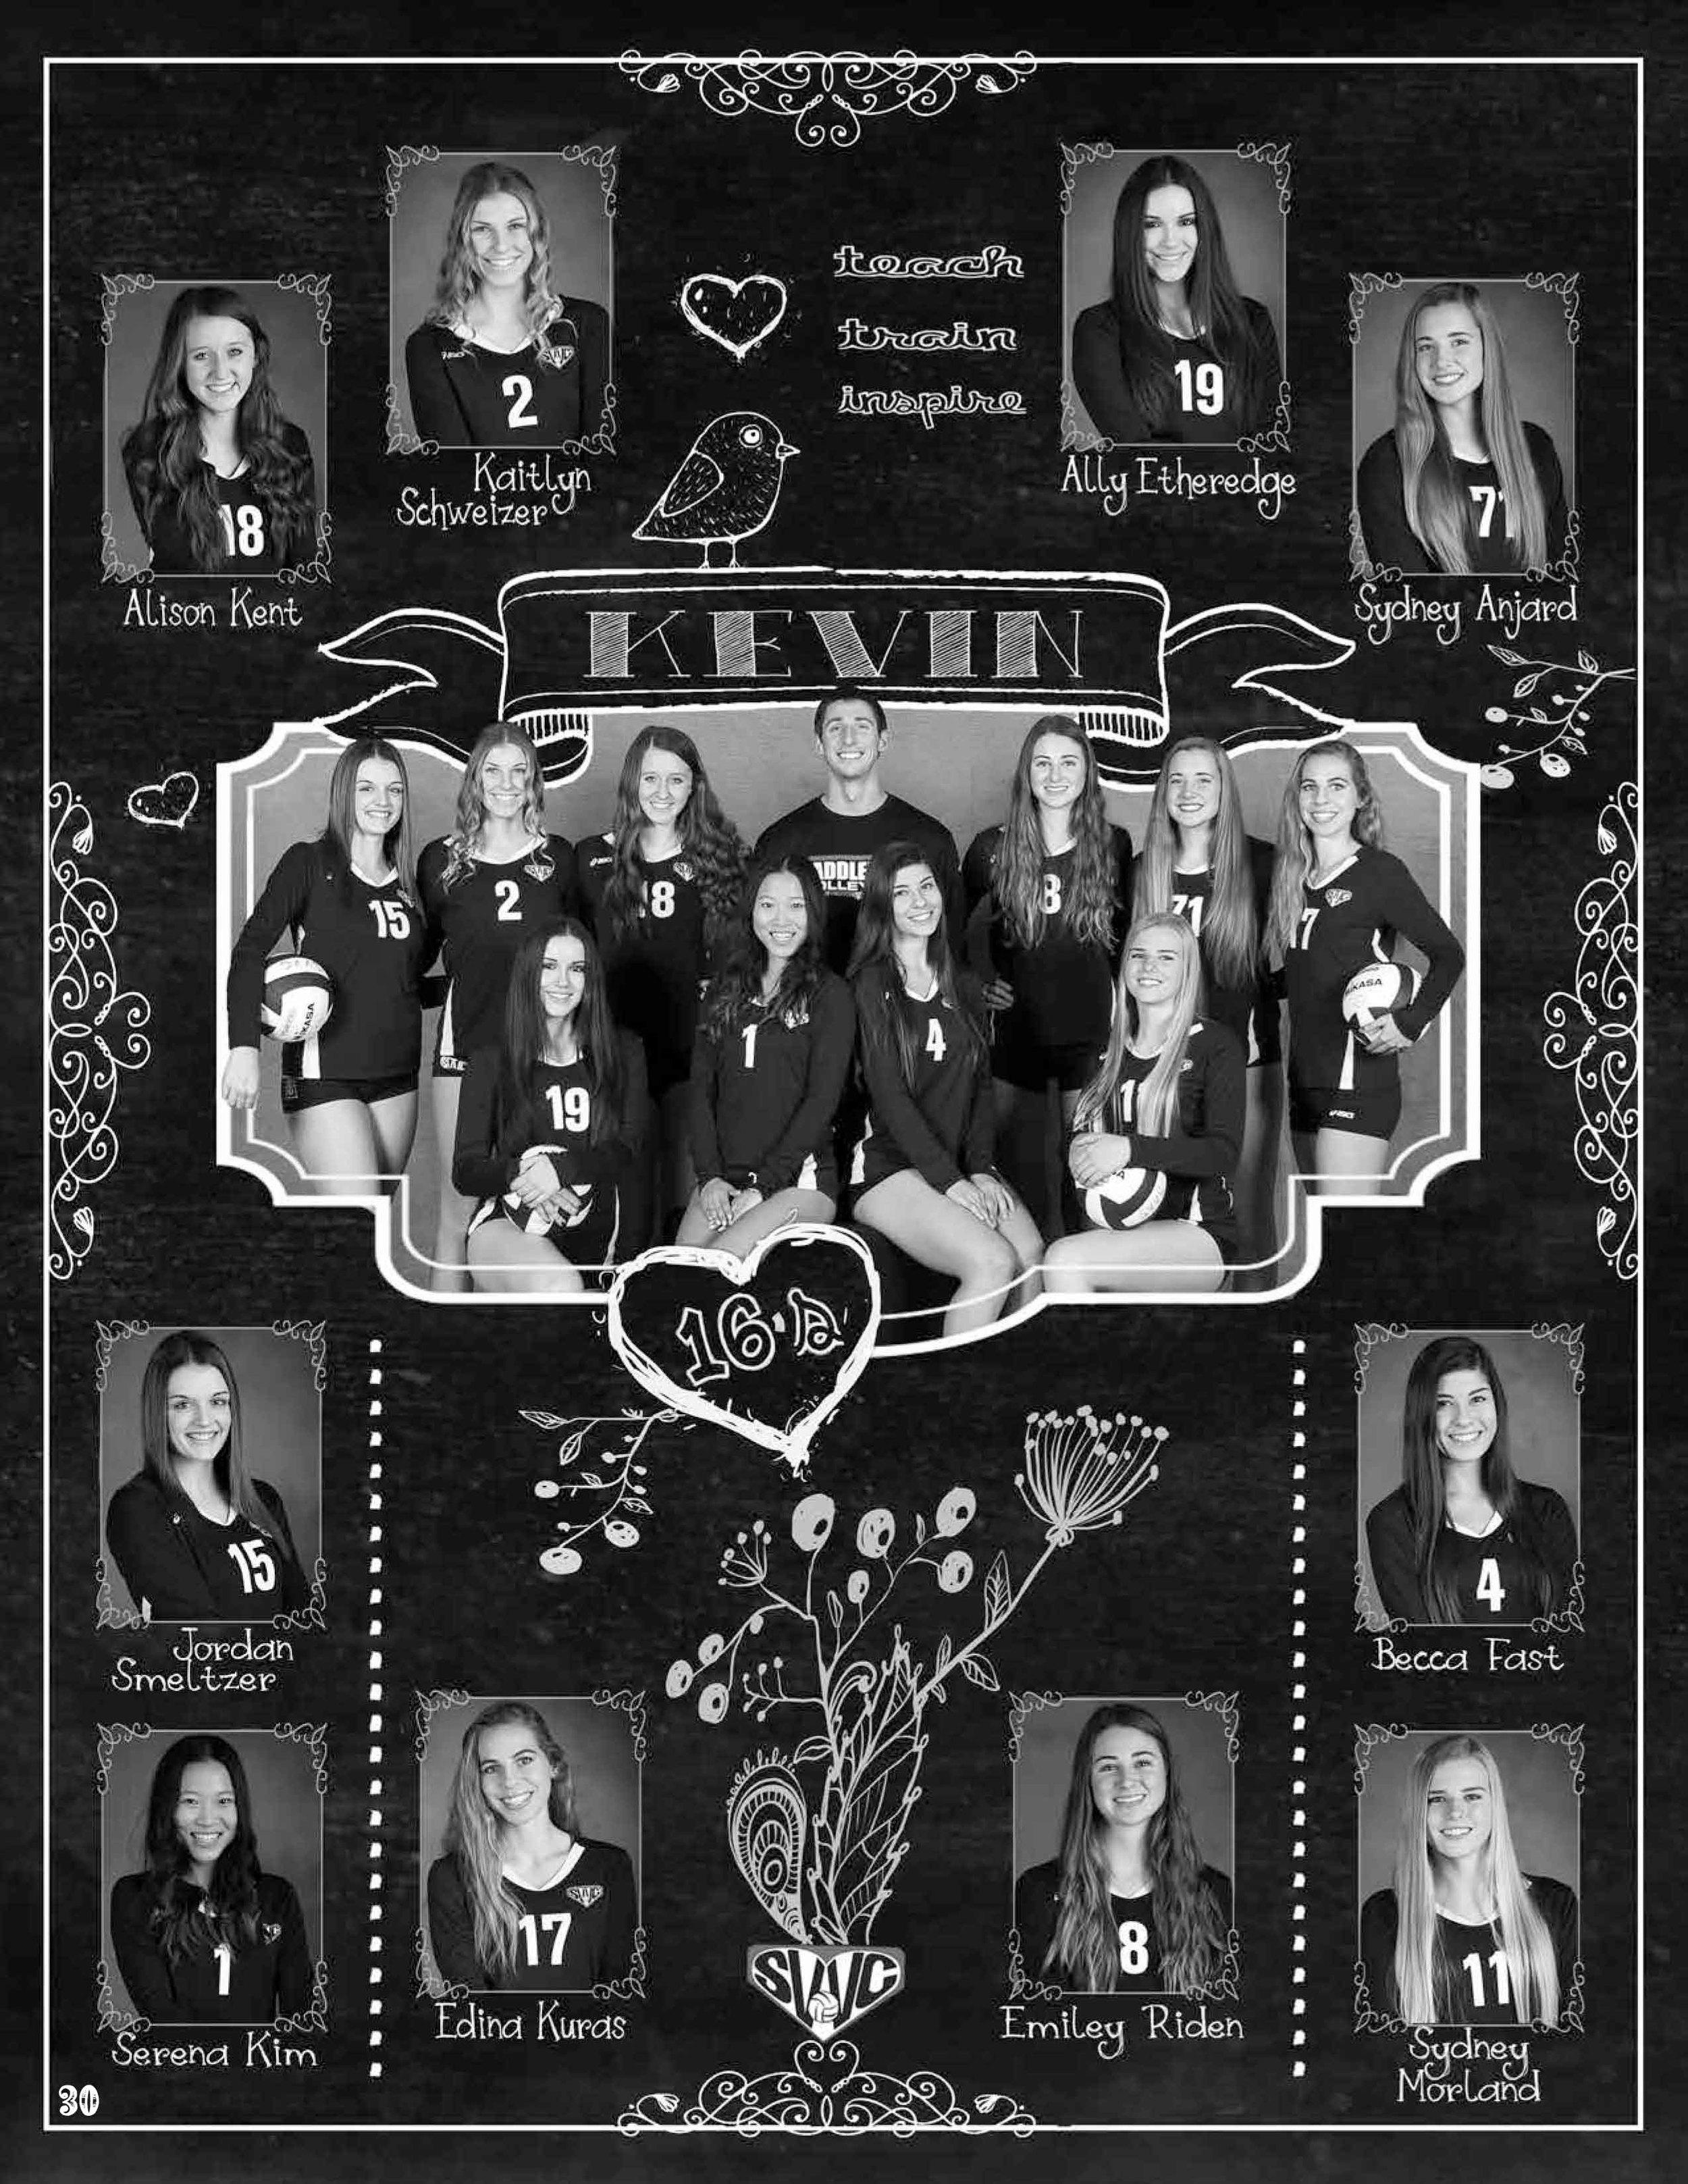 SADDLEBACK Yearbook proof #2-32.jpg